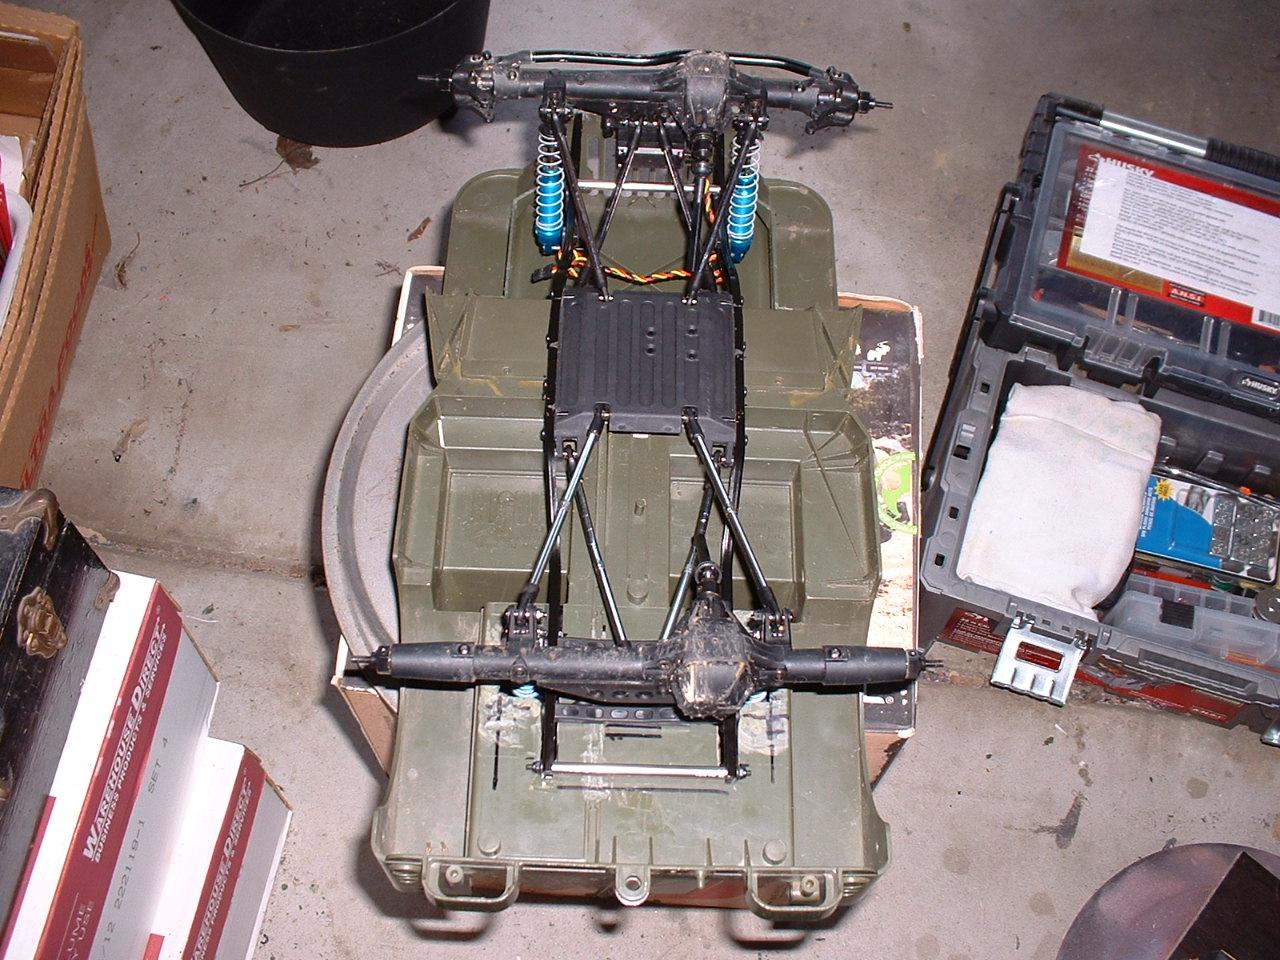 Click image for larger version  Name:G.I. Joe Jeep 4 009.JPG Views:1415 Size:324.2 KB ID:2037578